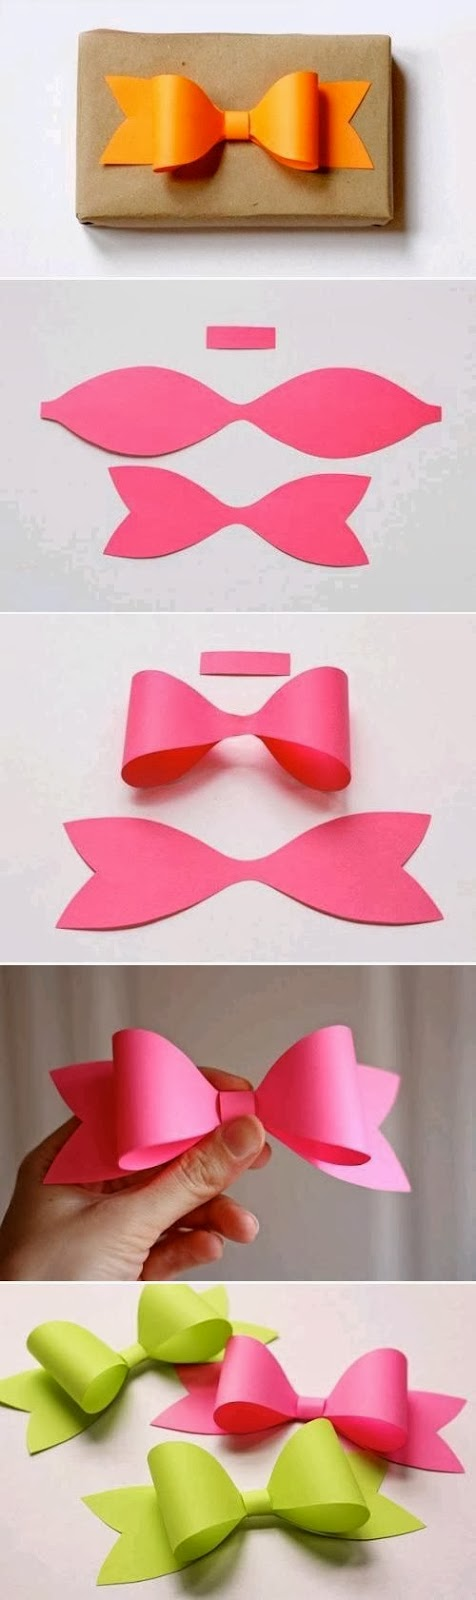 déco-de-nœud-papillon-en-papier-carton